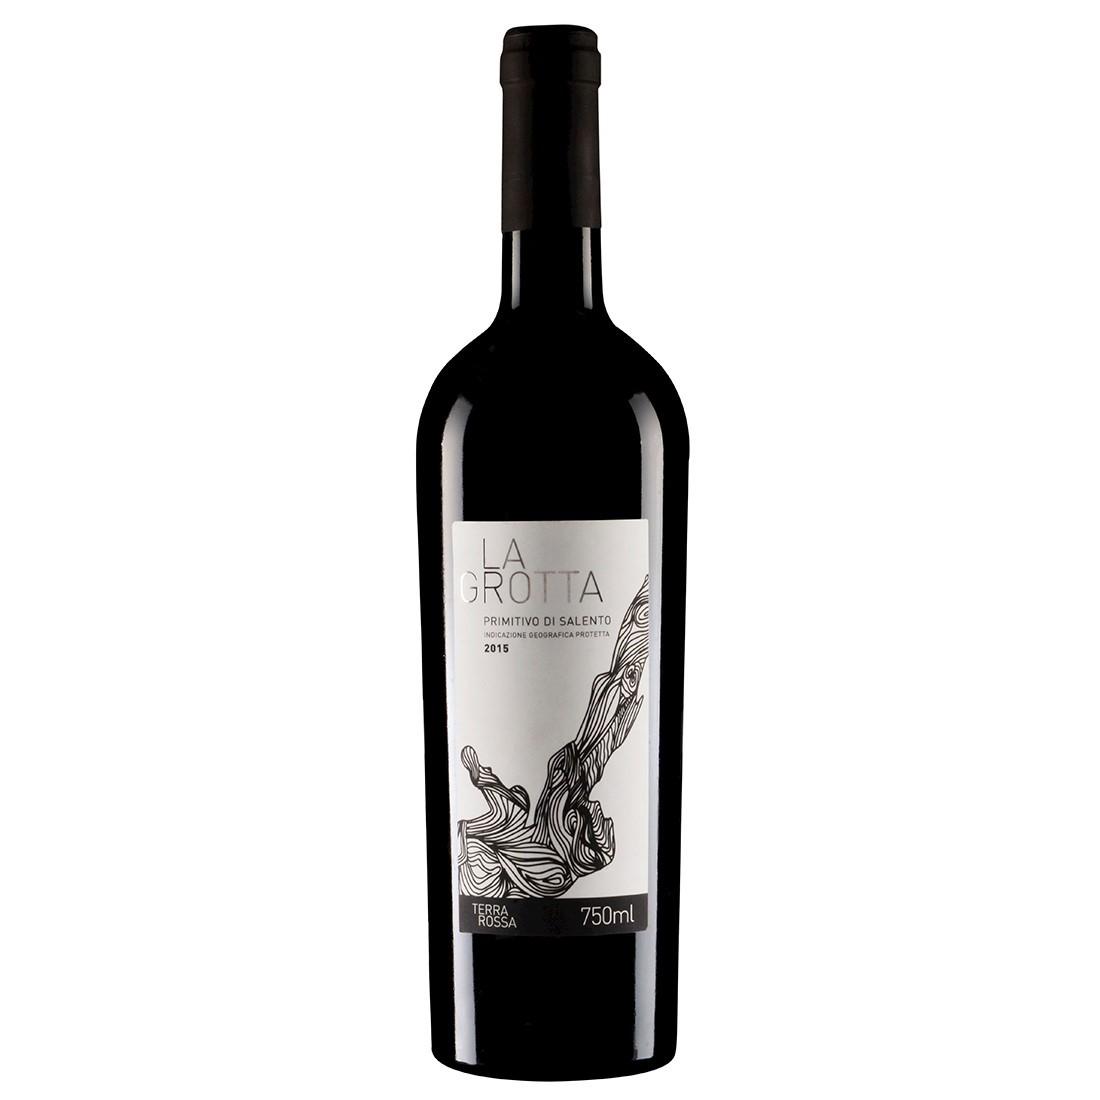 Vinho Italiano La Grotta Primitivo di Salento IGP 2018(750ml)